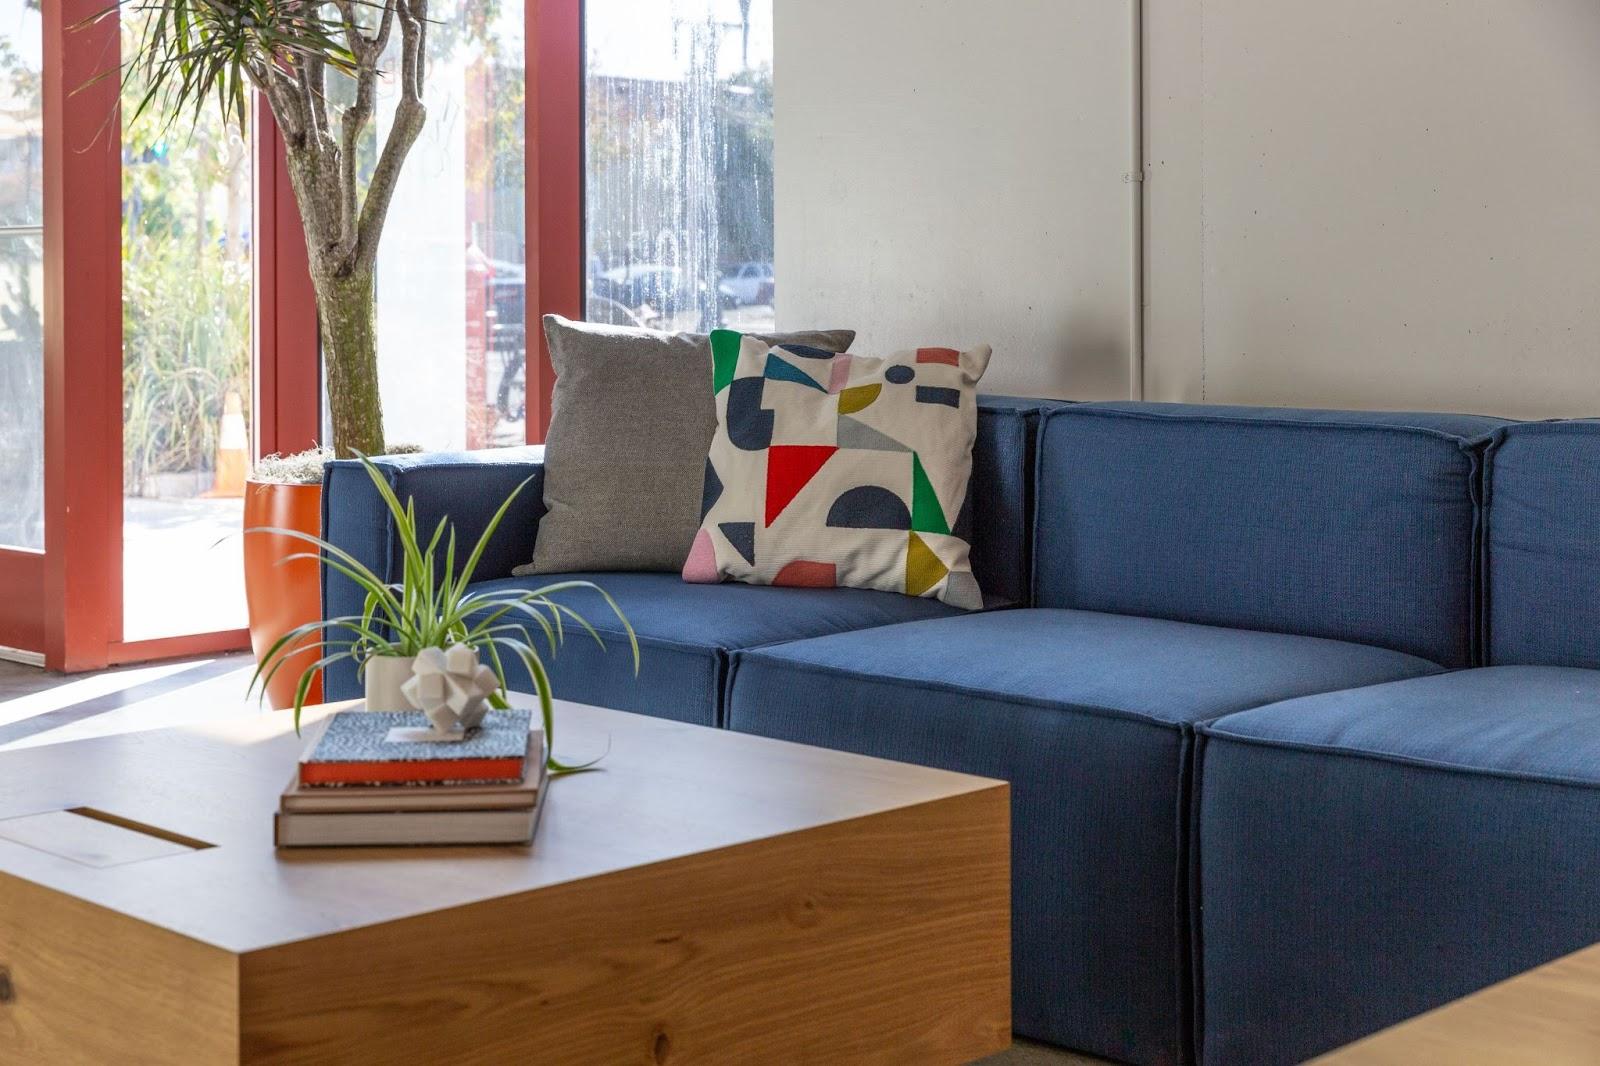 custom sofa olorful pillows orange window frames coworking space